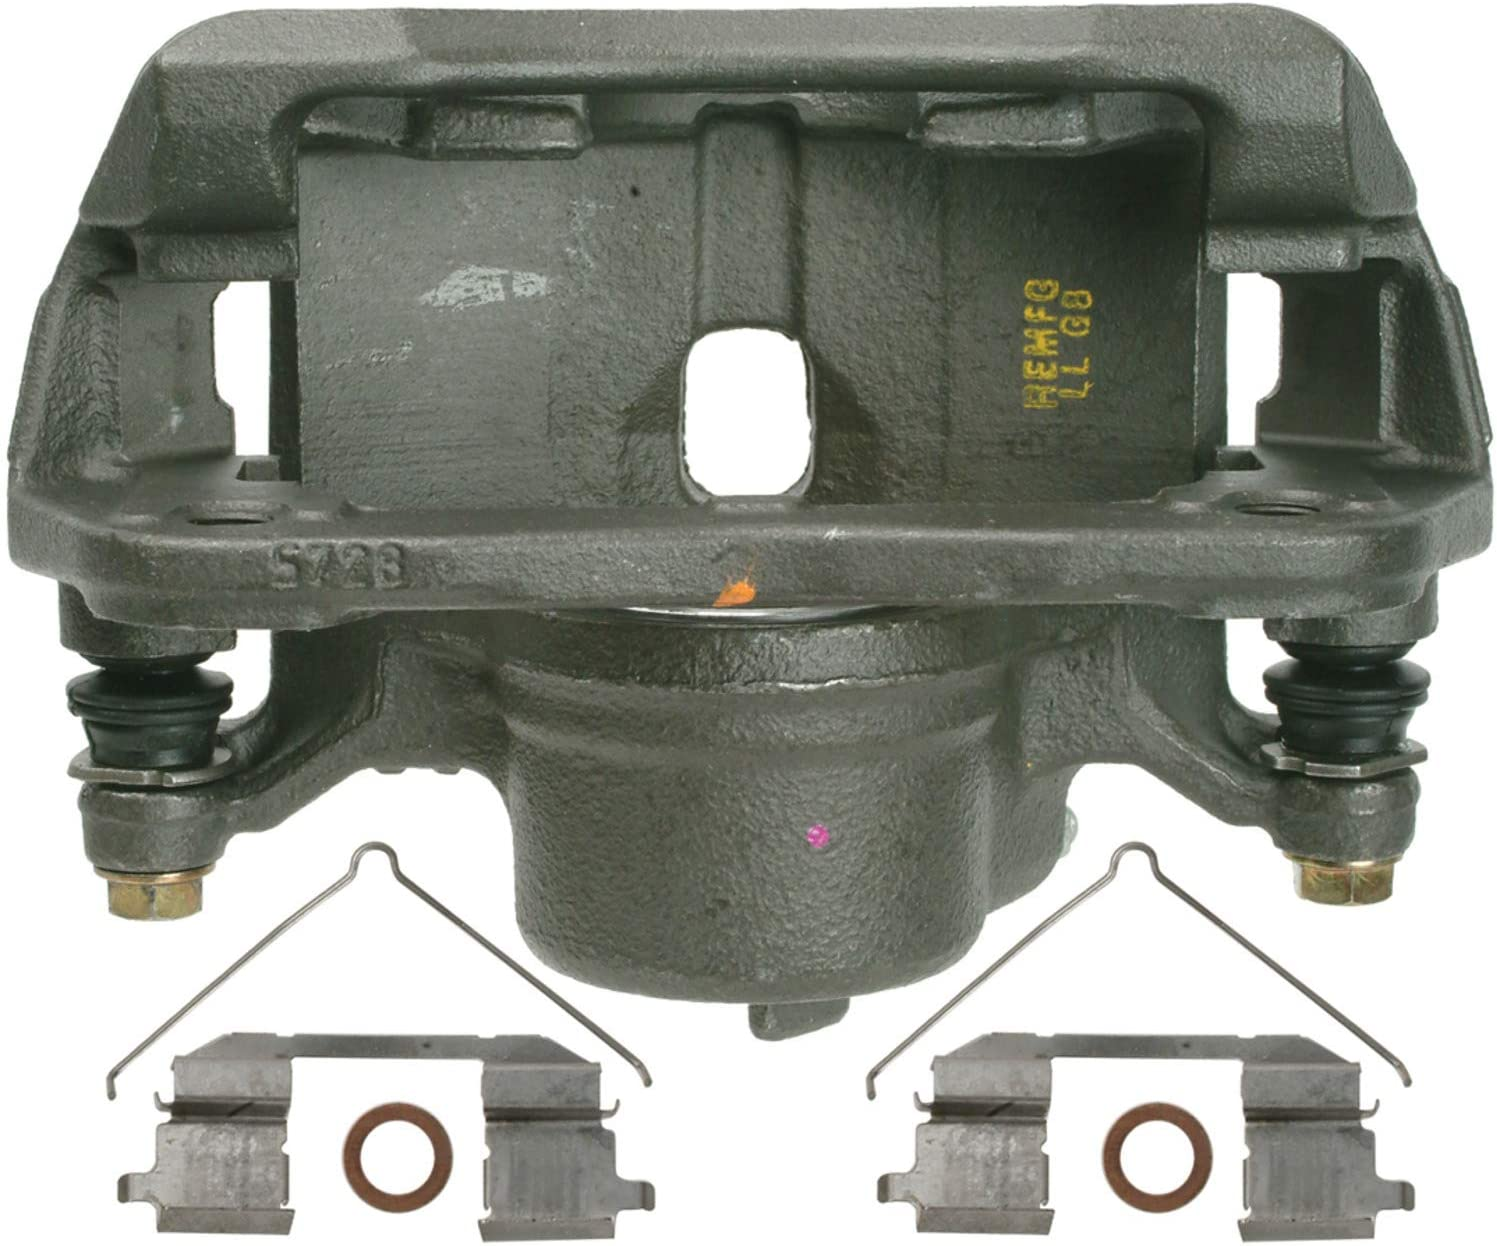 Cardone 19-B2662 Remanufactured Unloaded Disc Brake Caliper with Bracket